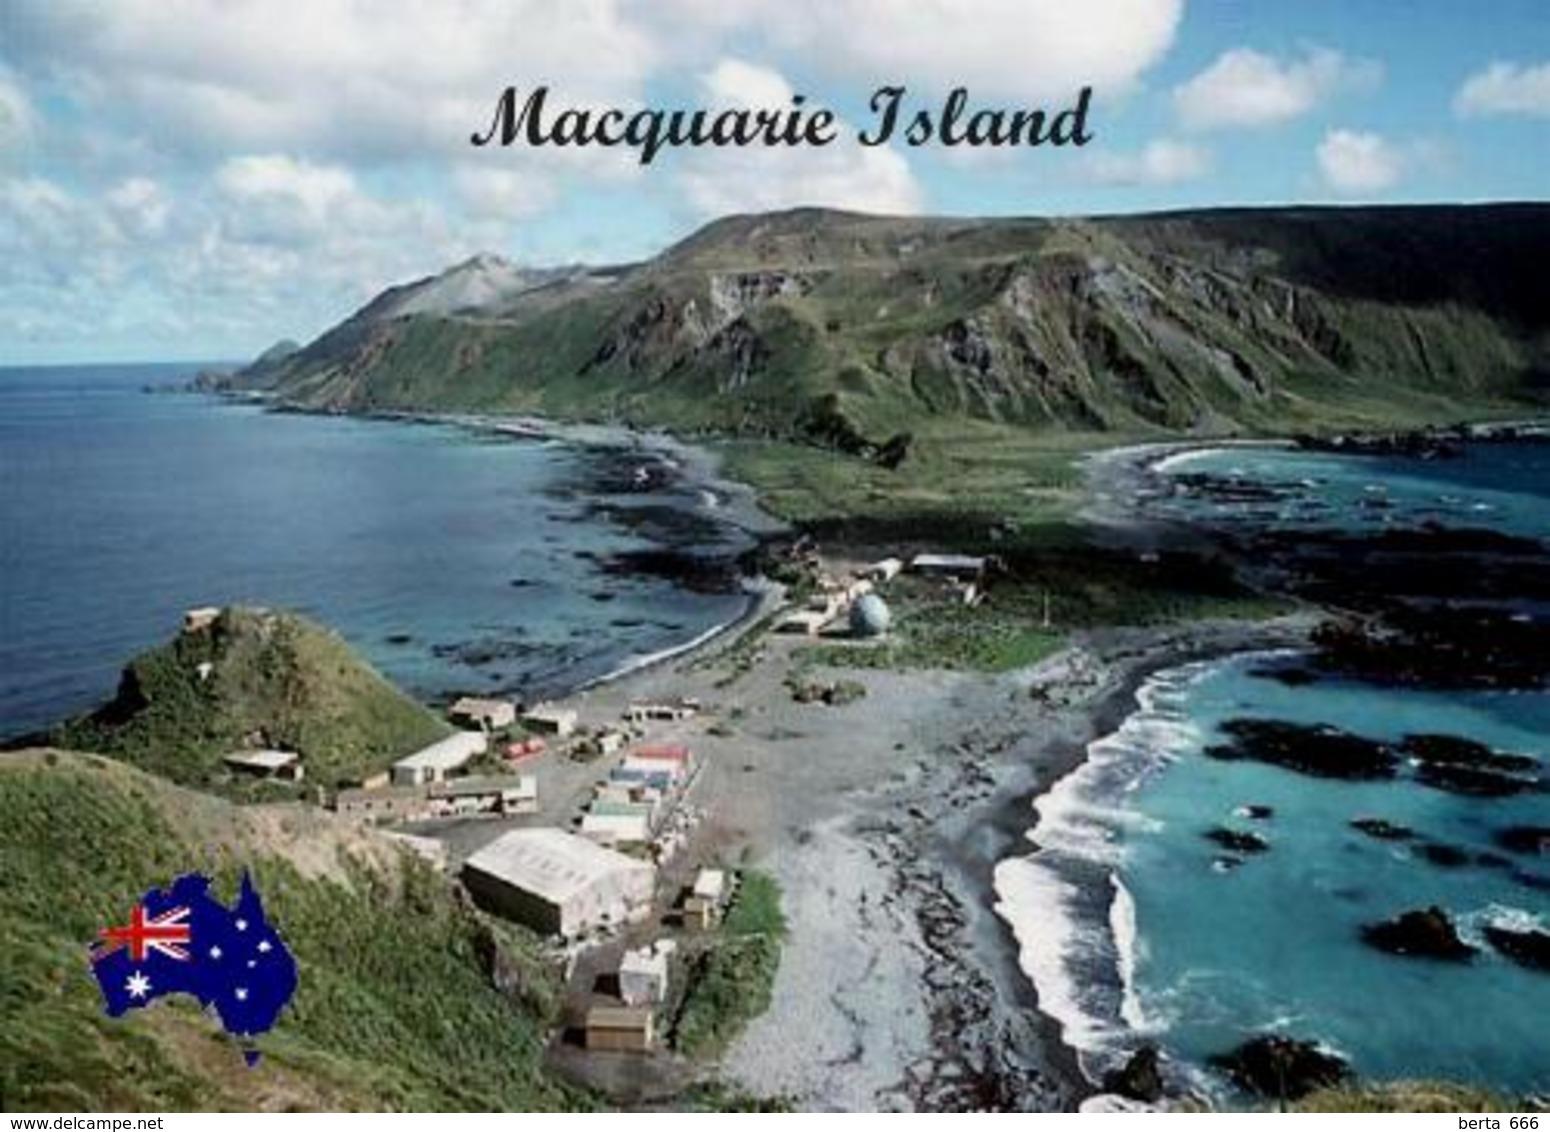 Macquarie Island Aerial View UNESCO Australia New Postcard - Australien